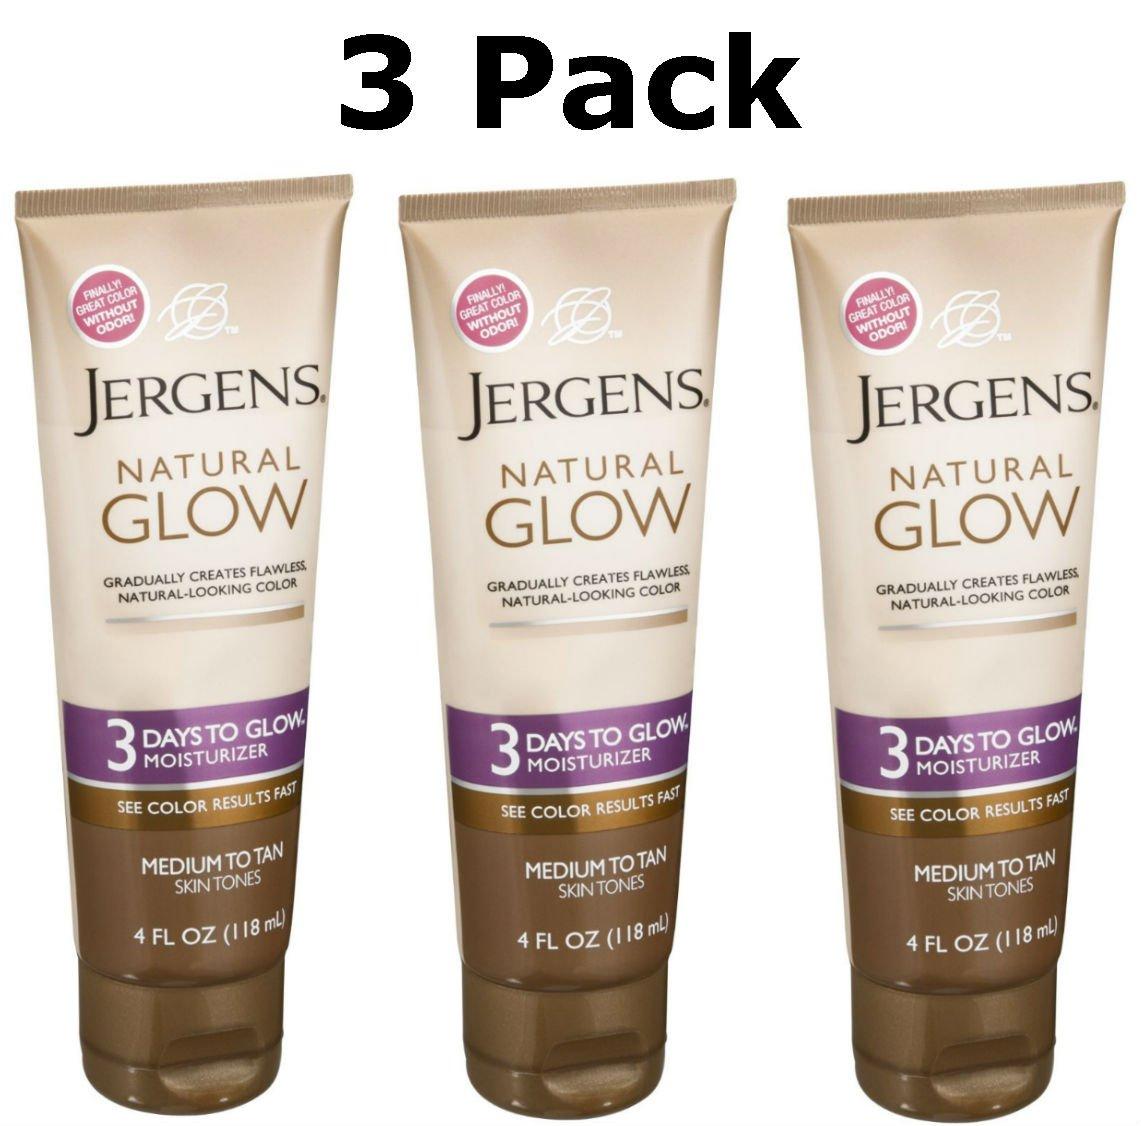 Jergens Natural Glow 3 Days to Glow Moisturizer, Medium to Tan 4 oz (Pack of 3)